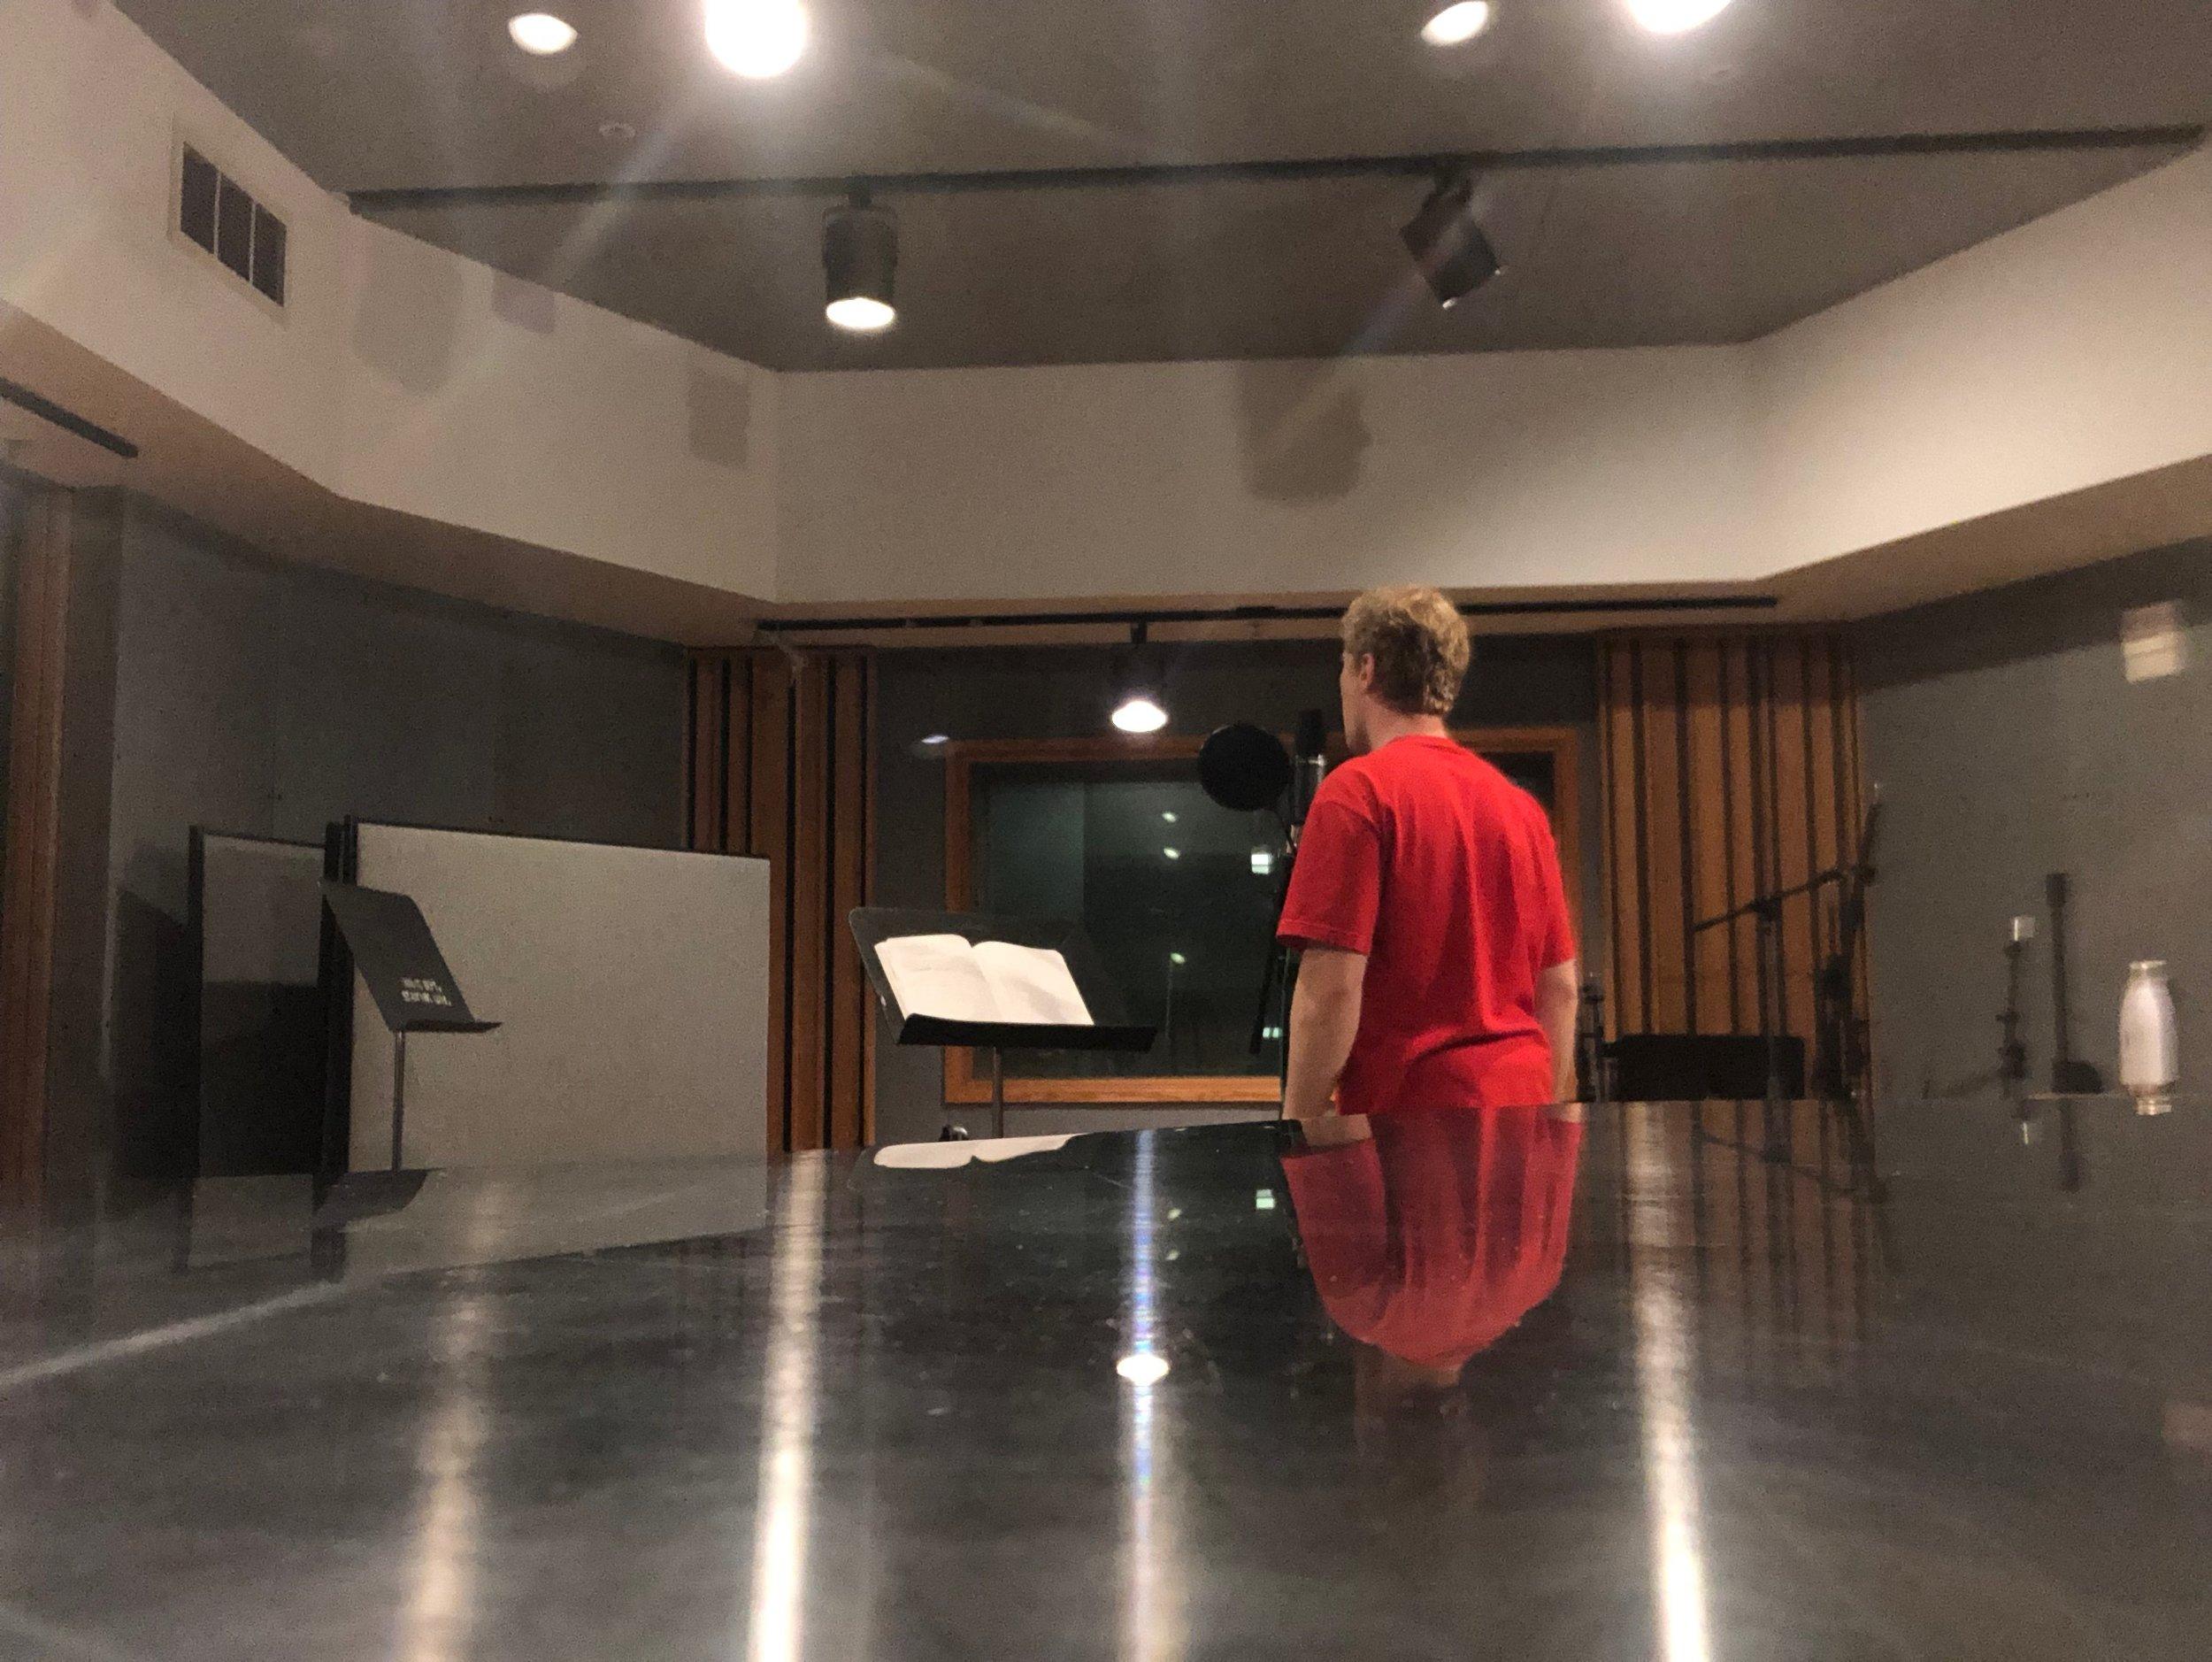 max-mccali-music-in-the-studio-recording-artist-singer-songwriter-themaxccaliexperience-singersongwriter-countrymusic-popmusic-edm-dancemusic-tropicalhousemusic-newmusic-recordingstudio-recordingartist-singer-vocals-musicproducer.JPG